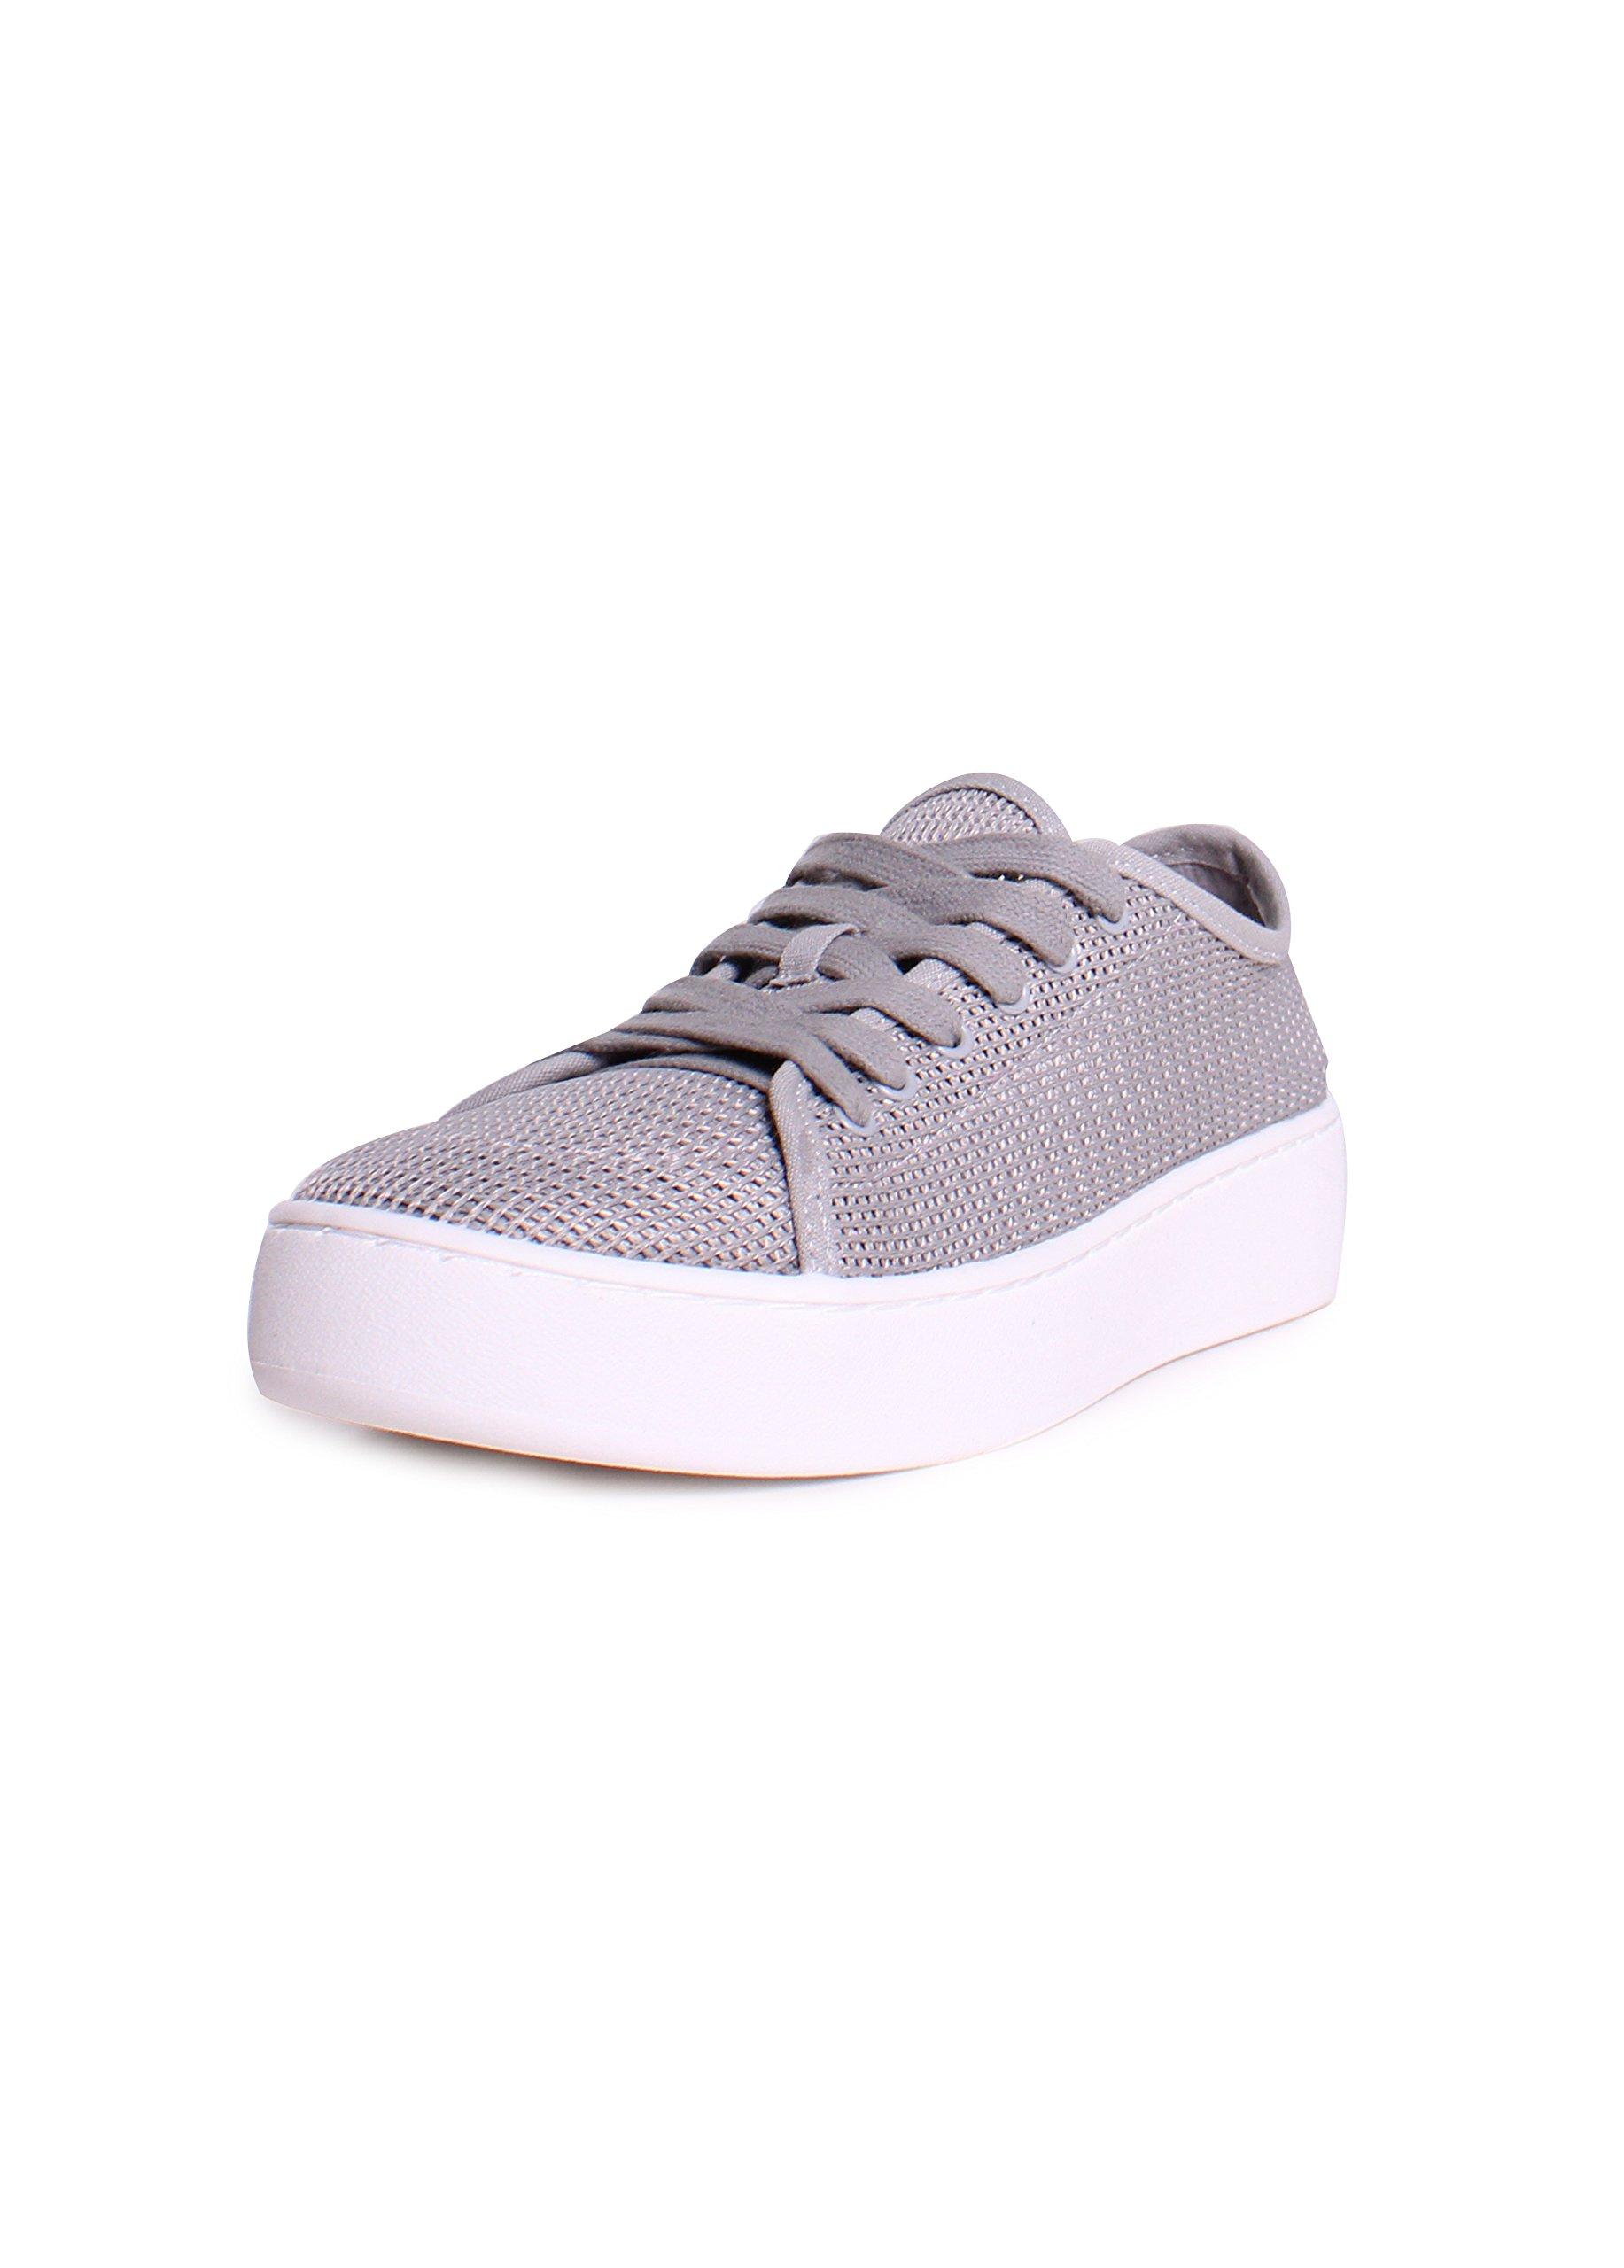 Donald J Pliner Women's Cecile Sneaker, Silver, 9.5 Medium US